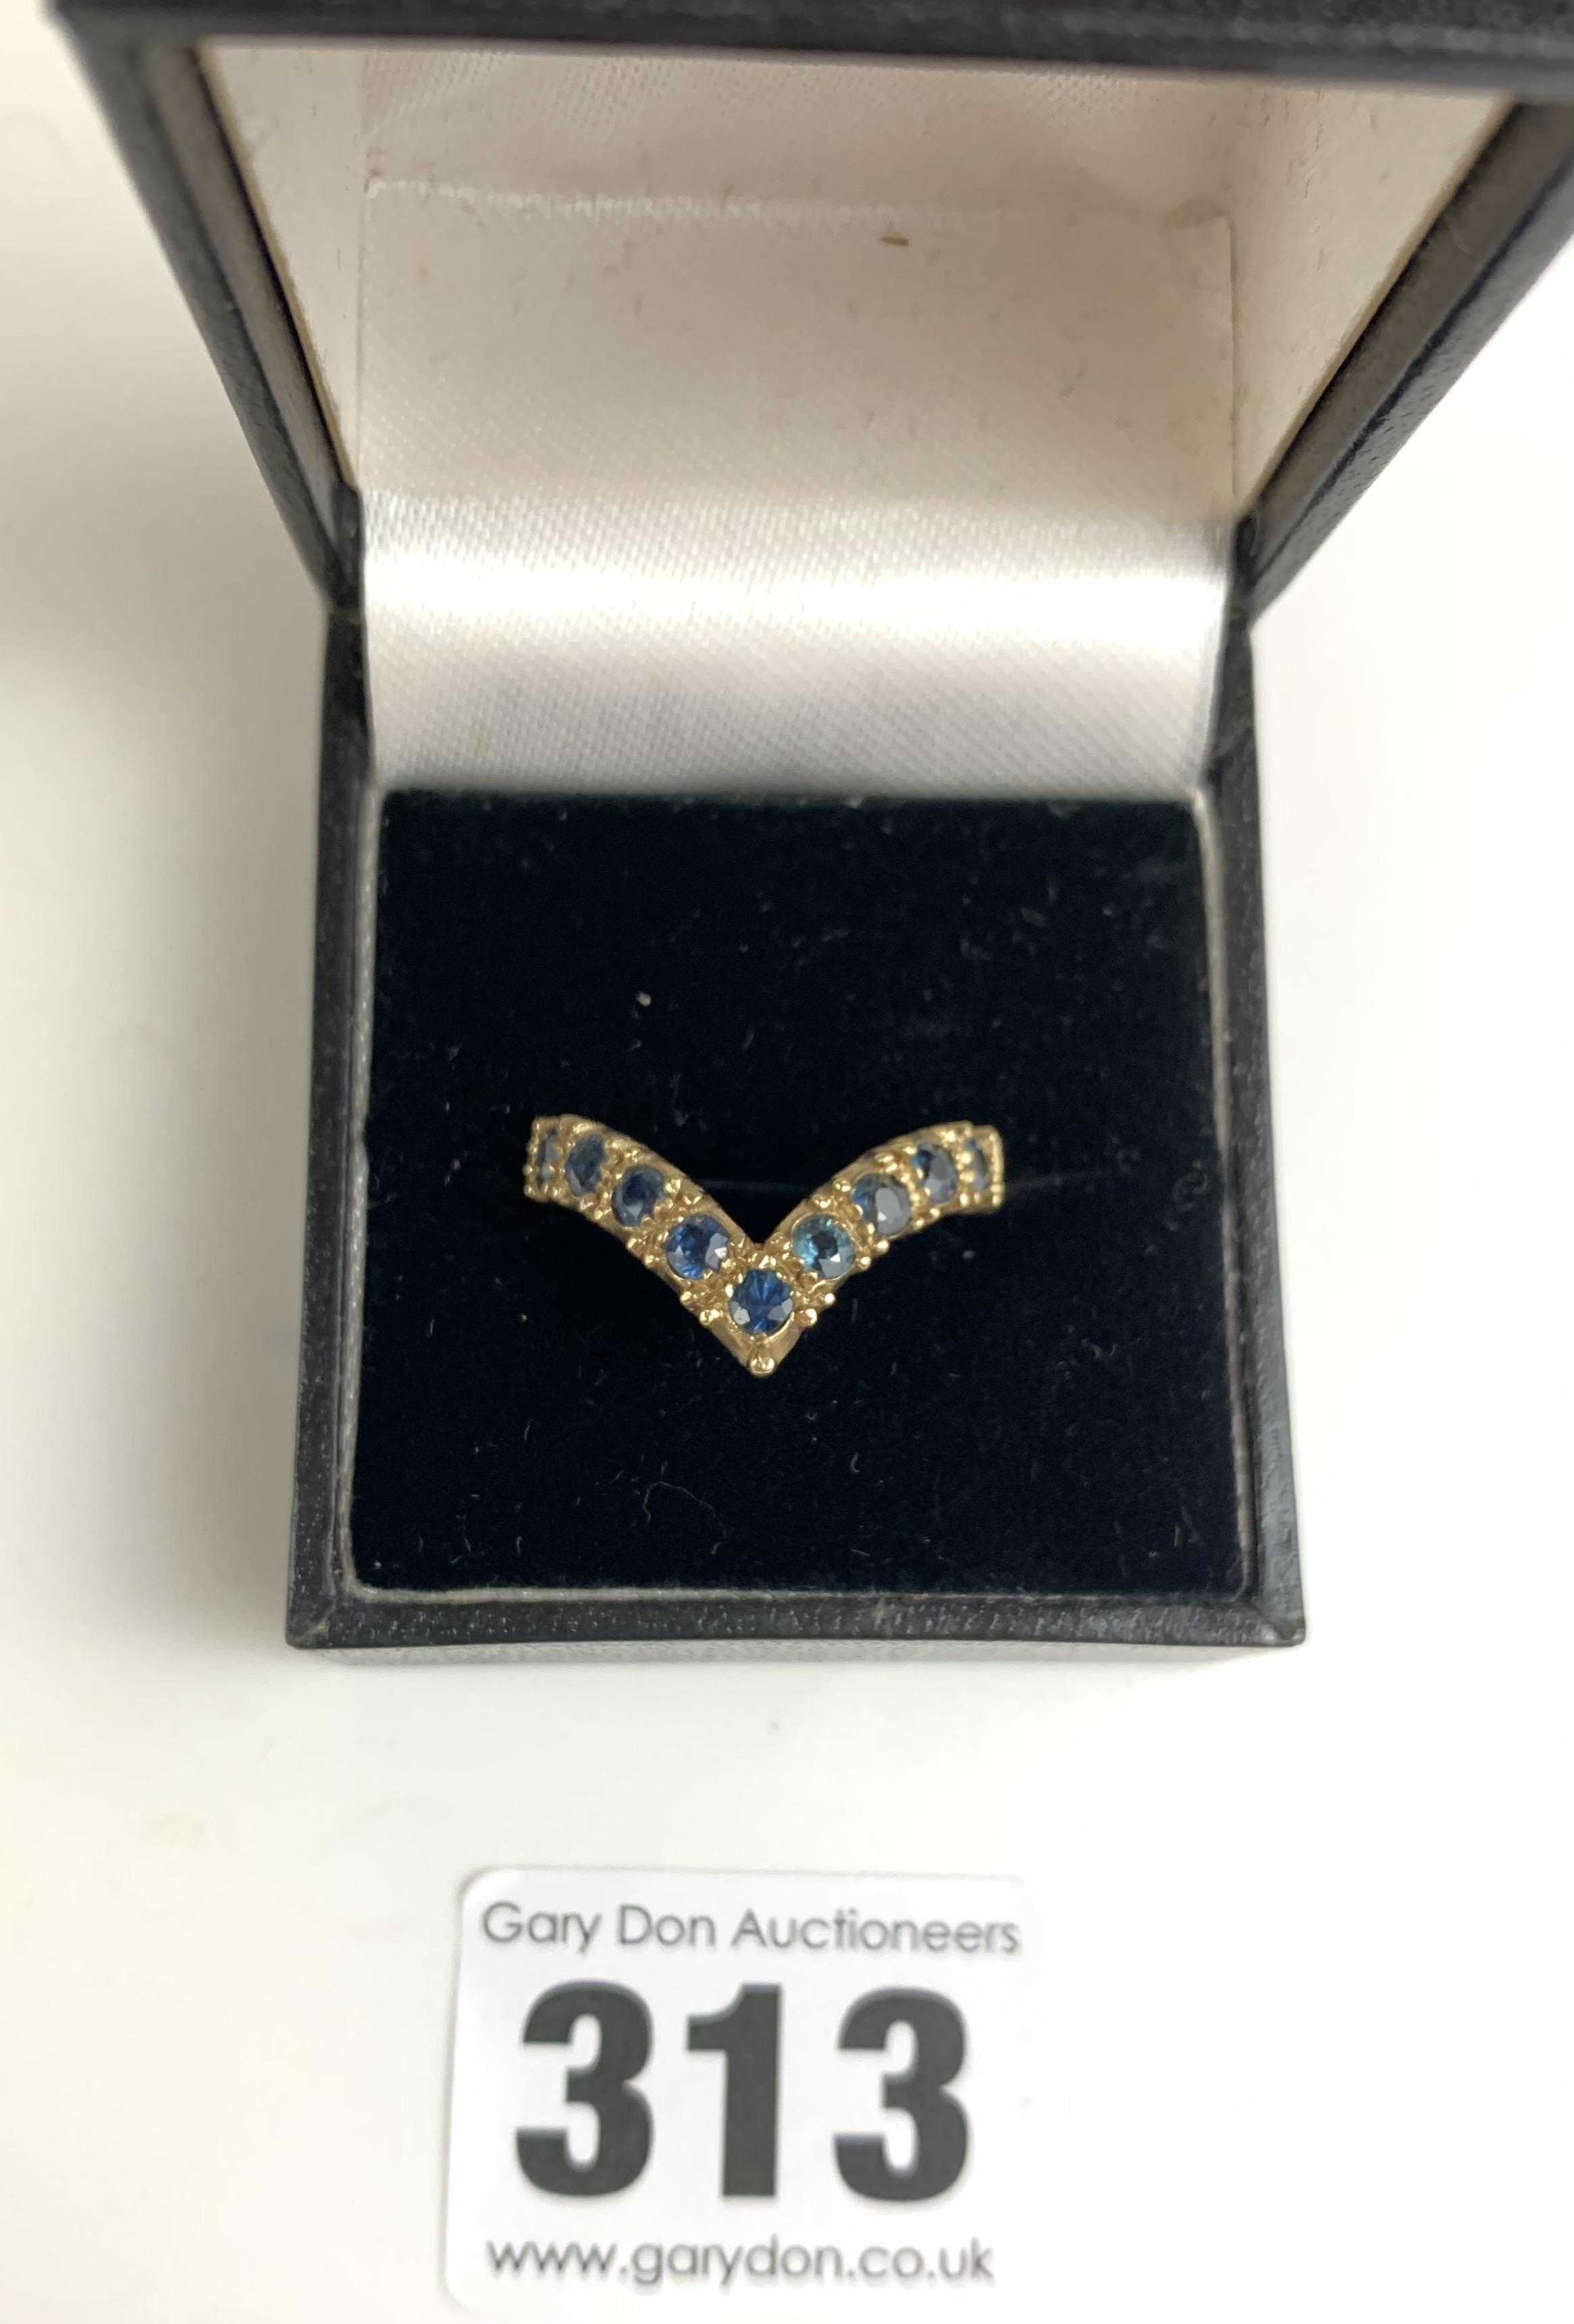 9k gold and blue stone wishbone ring, size N/O, w: 3.5 gms